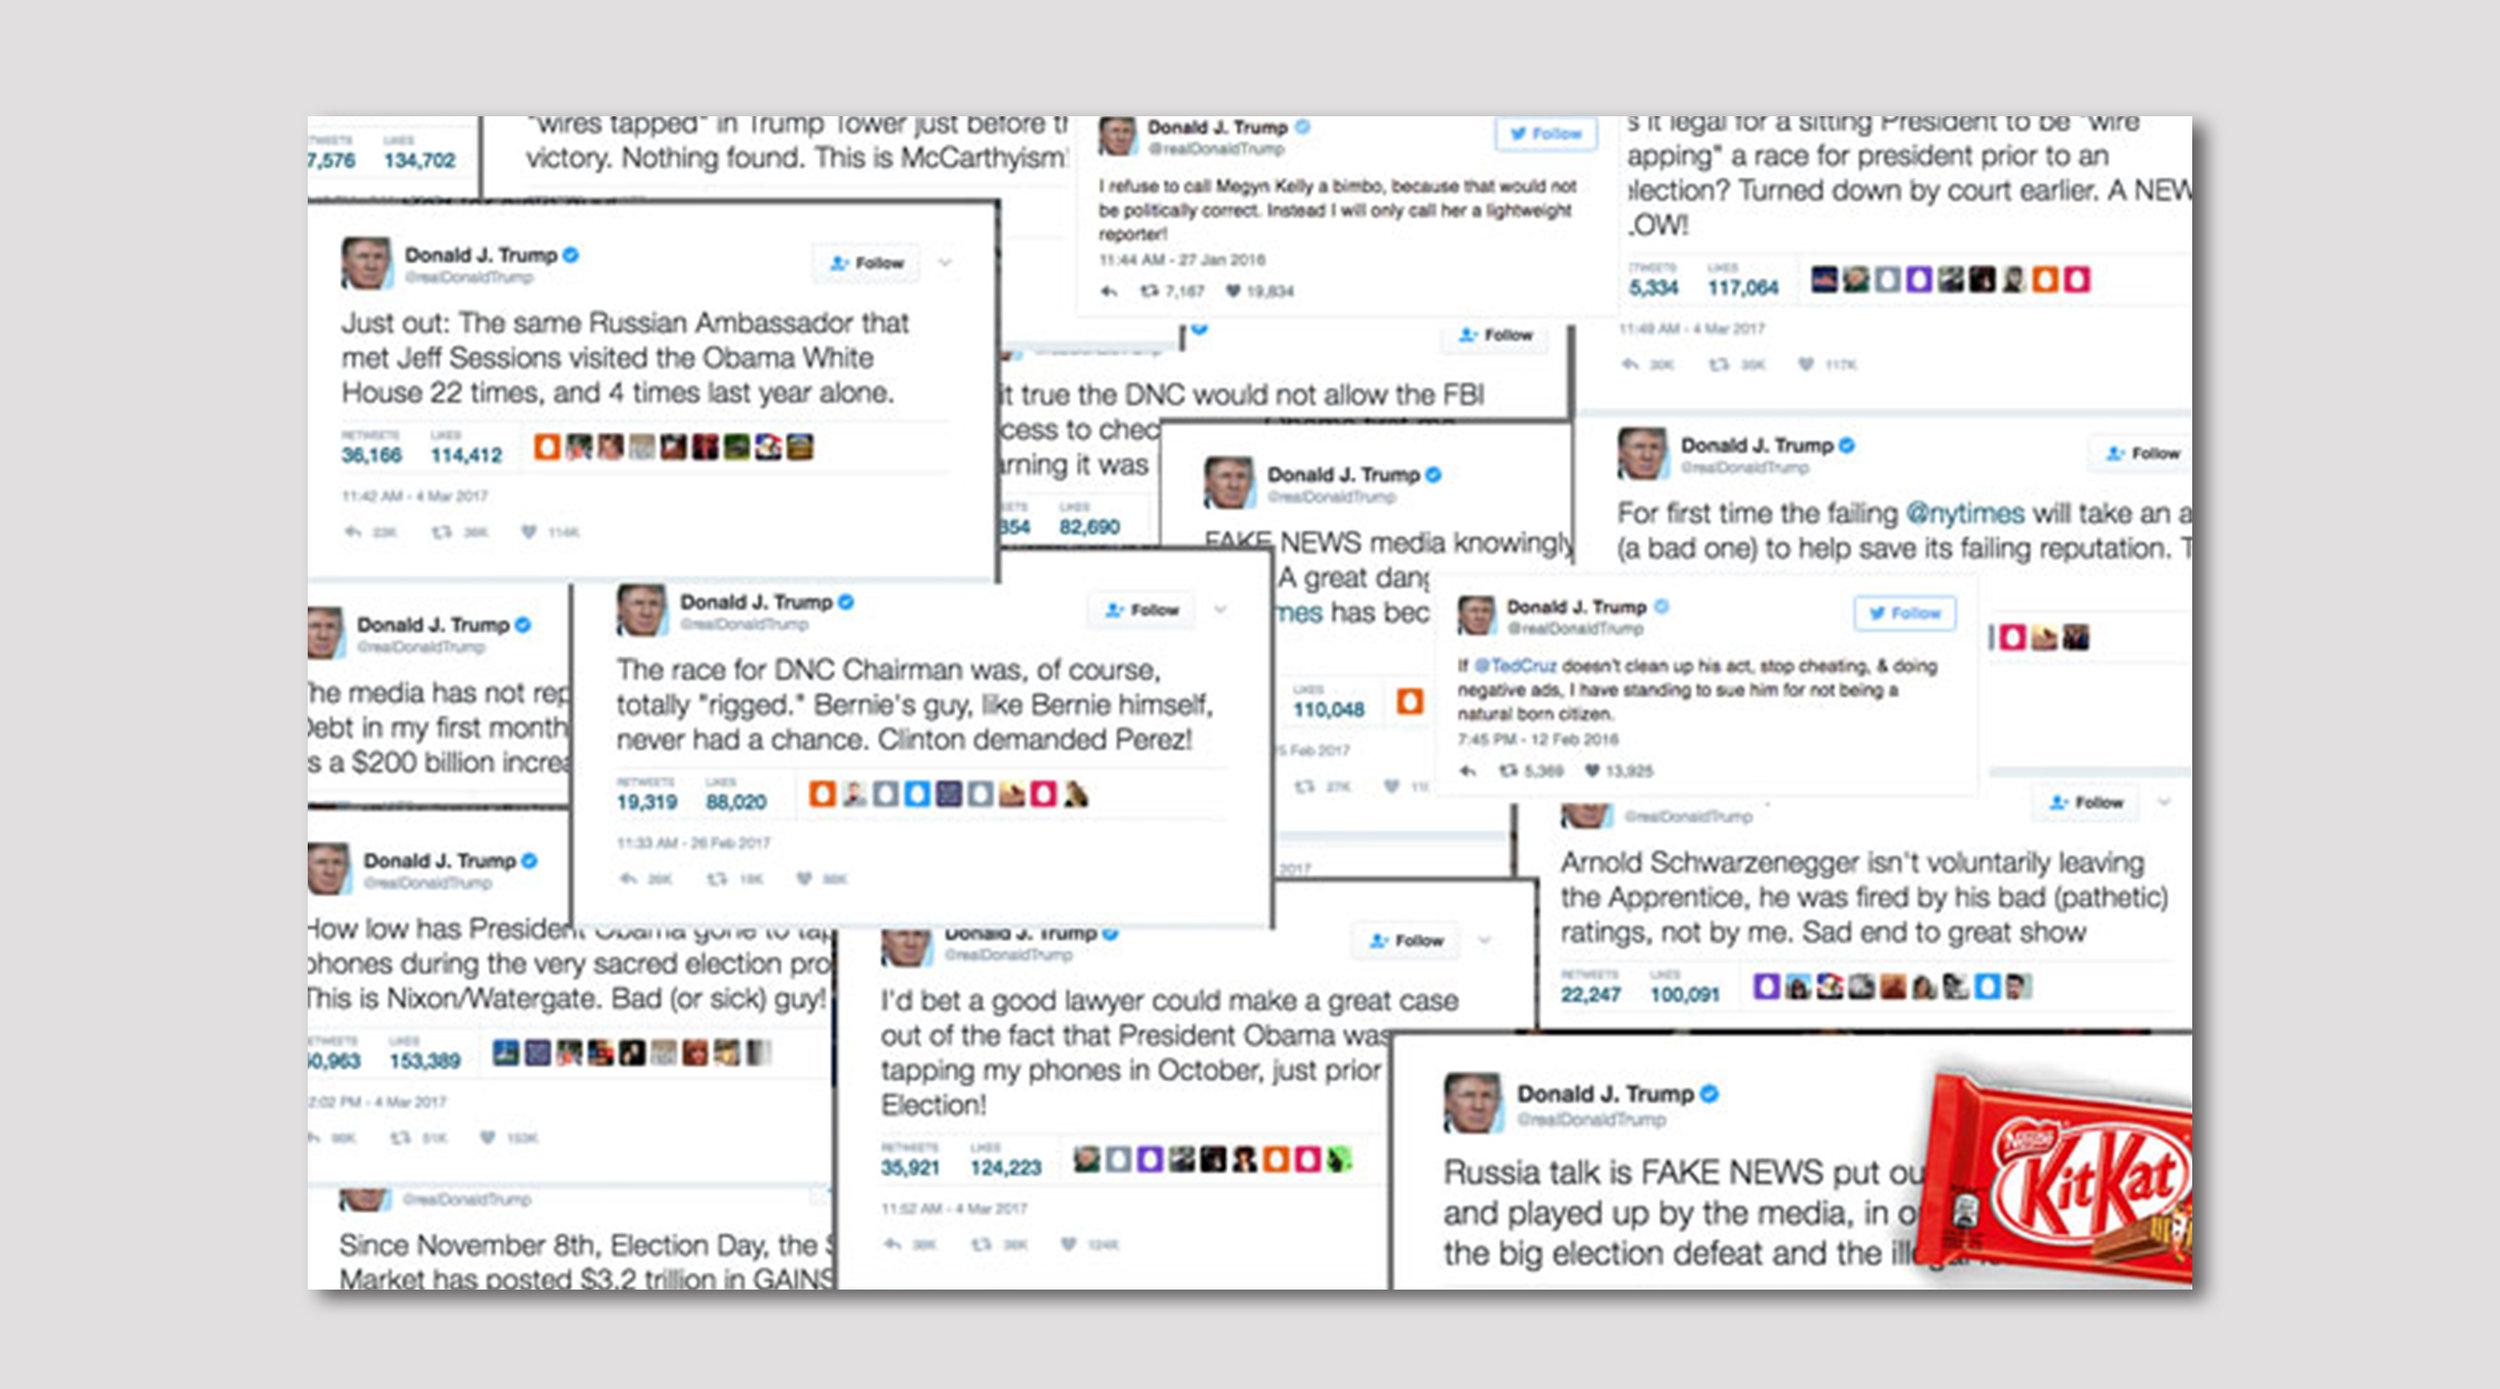 Trump_Drum_Border.jpg